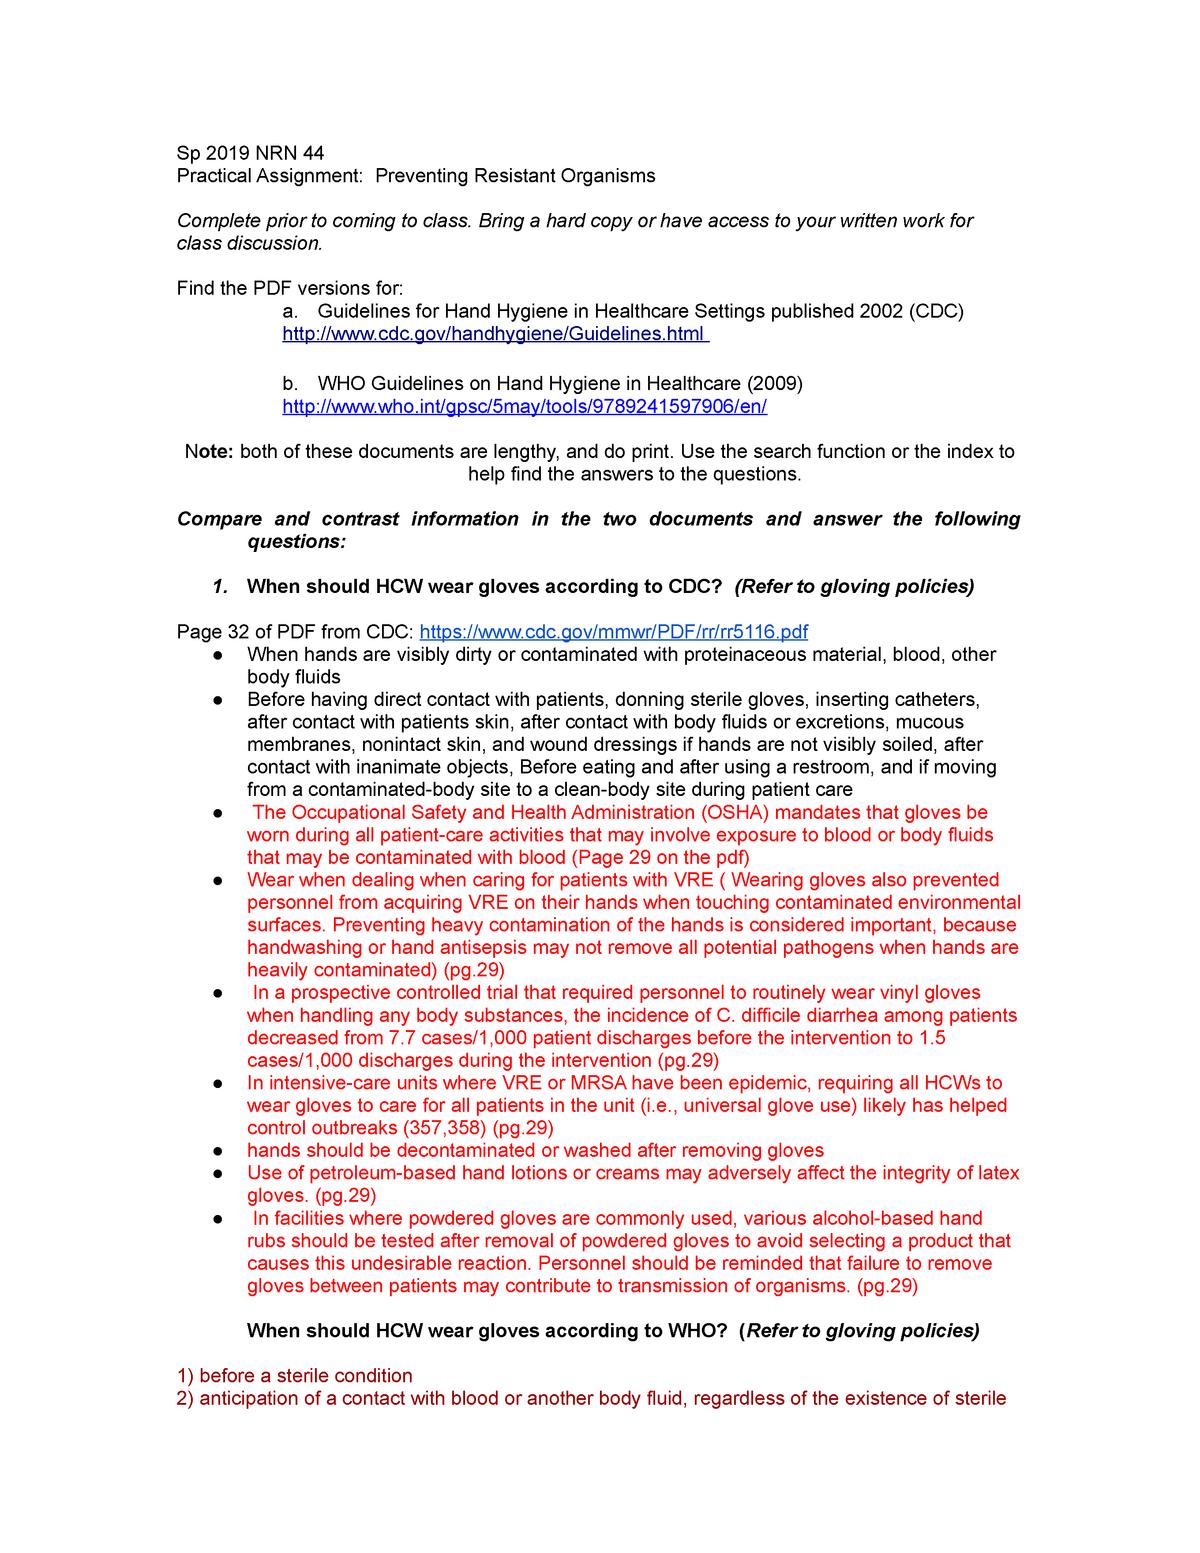 Sp19 44 PA6 Preventing Resistant Organisms - NURS 124: Nursing